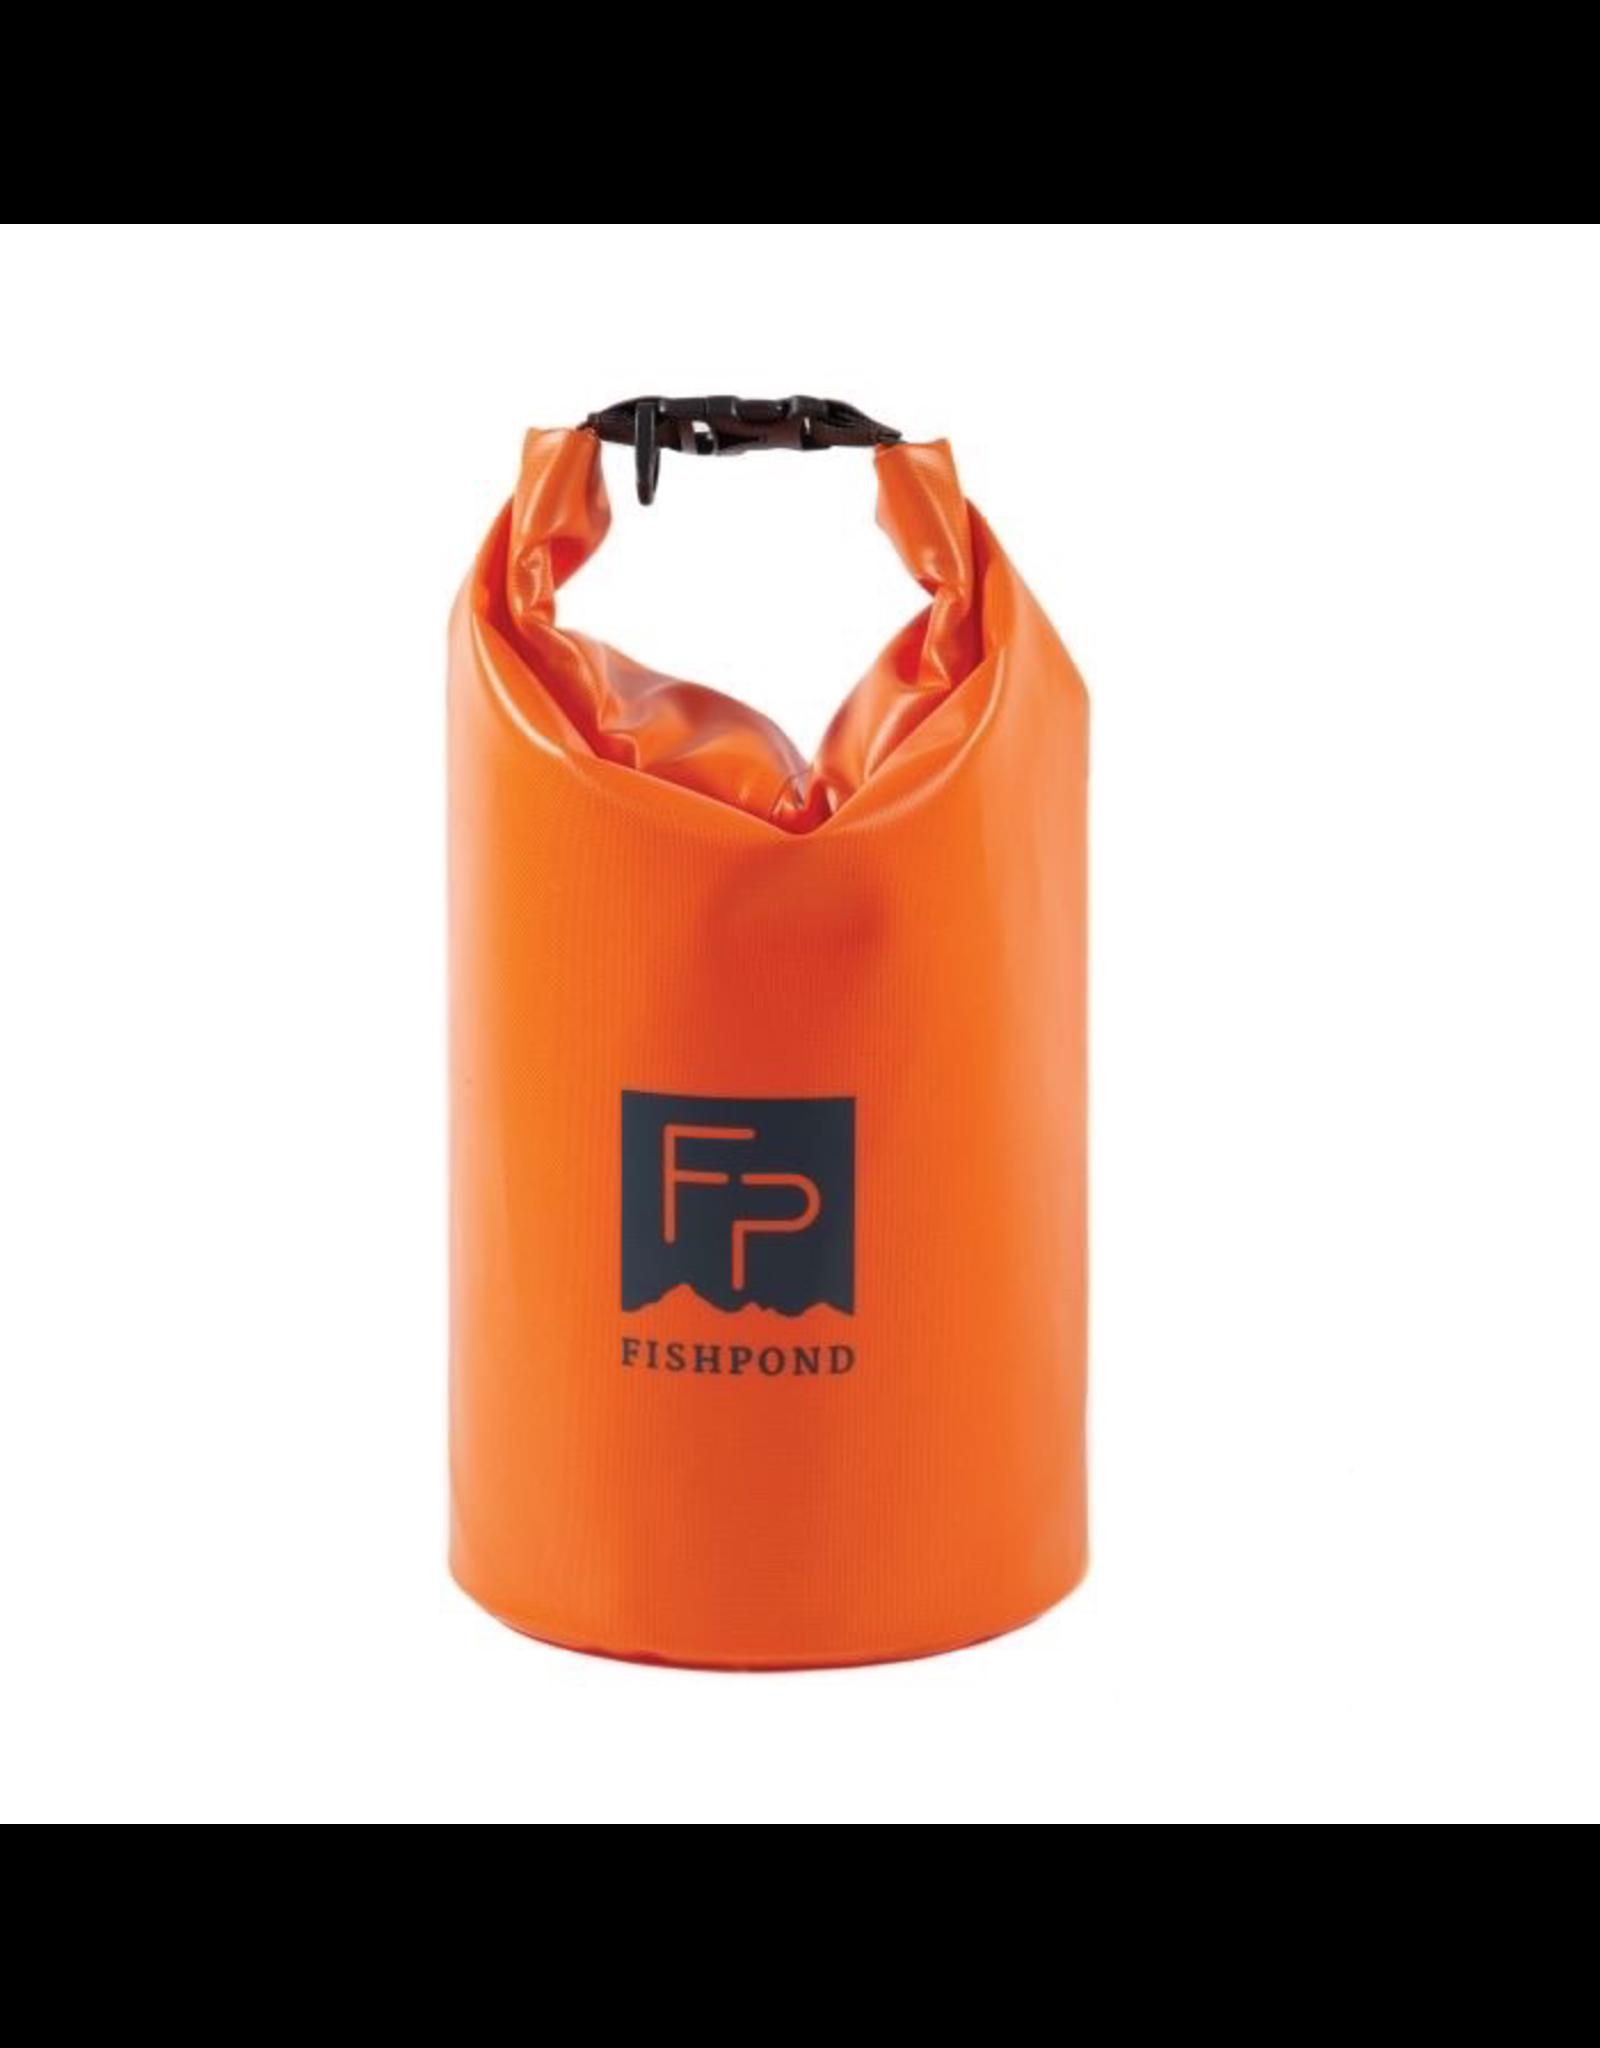 Fishpond Fishpond Thunderhead Roll Top Dry Bag Orange